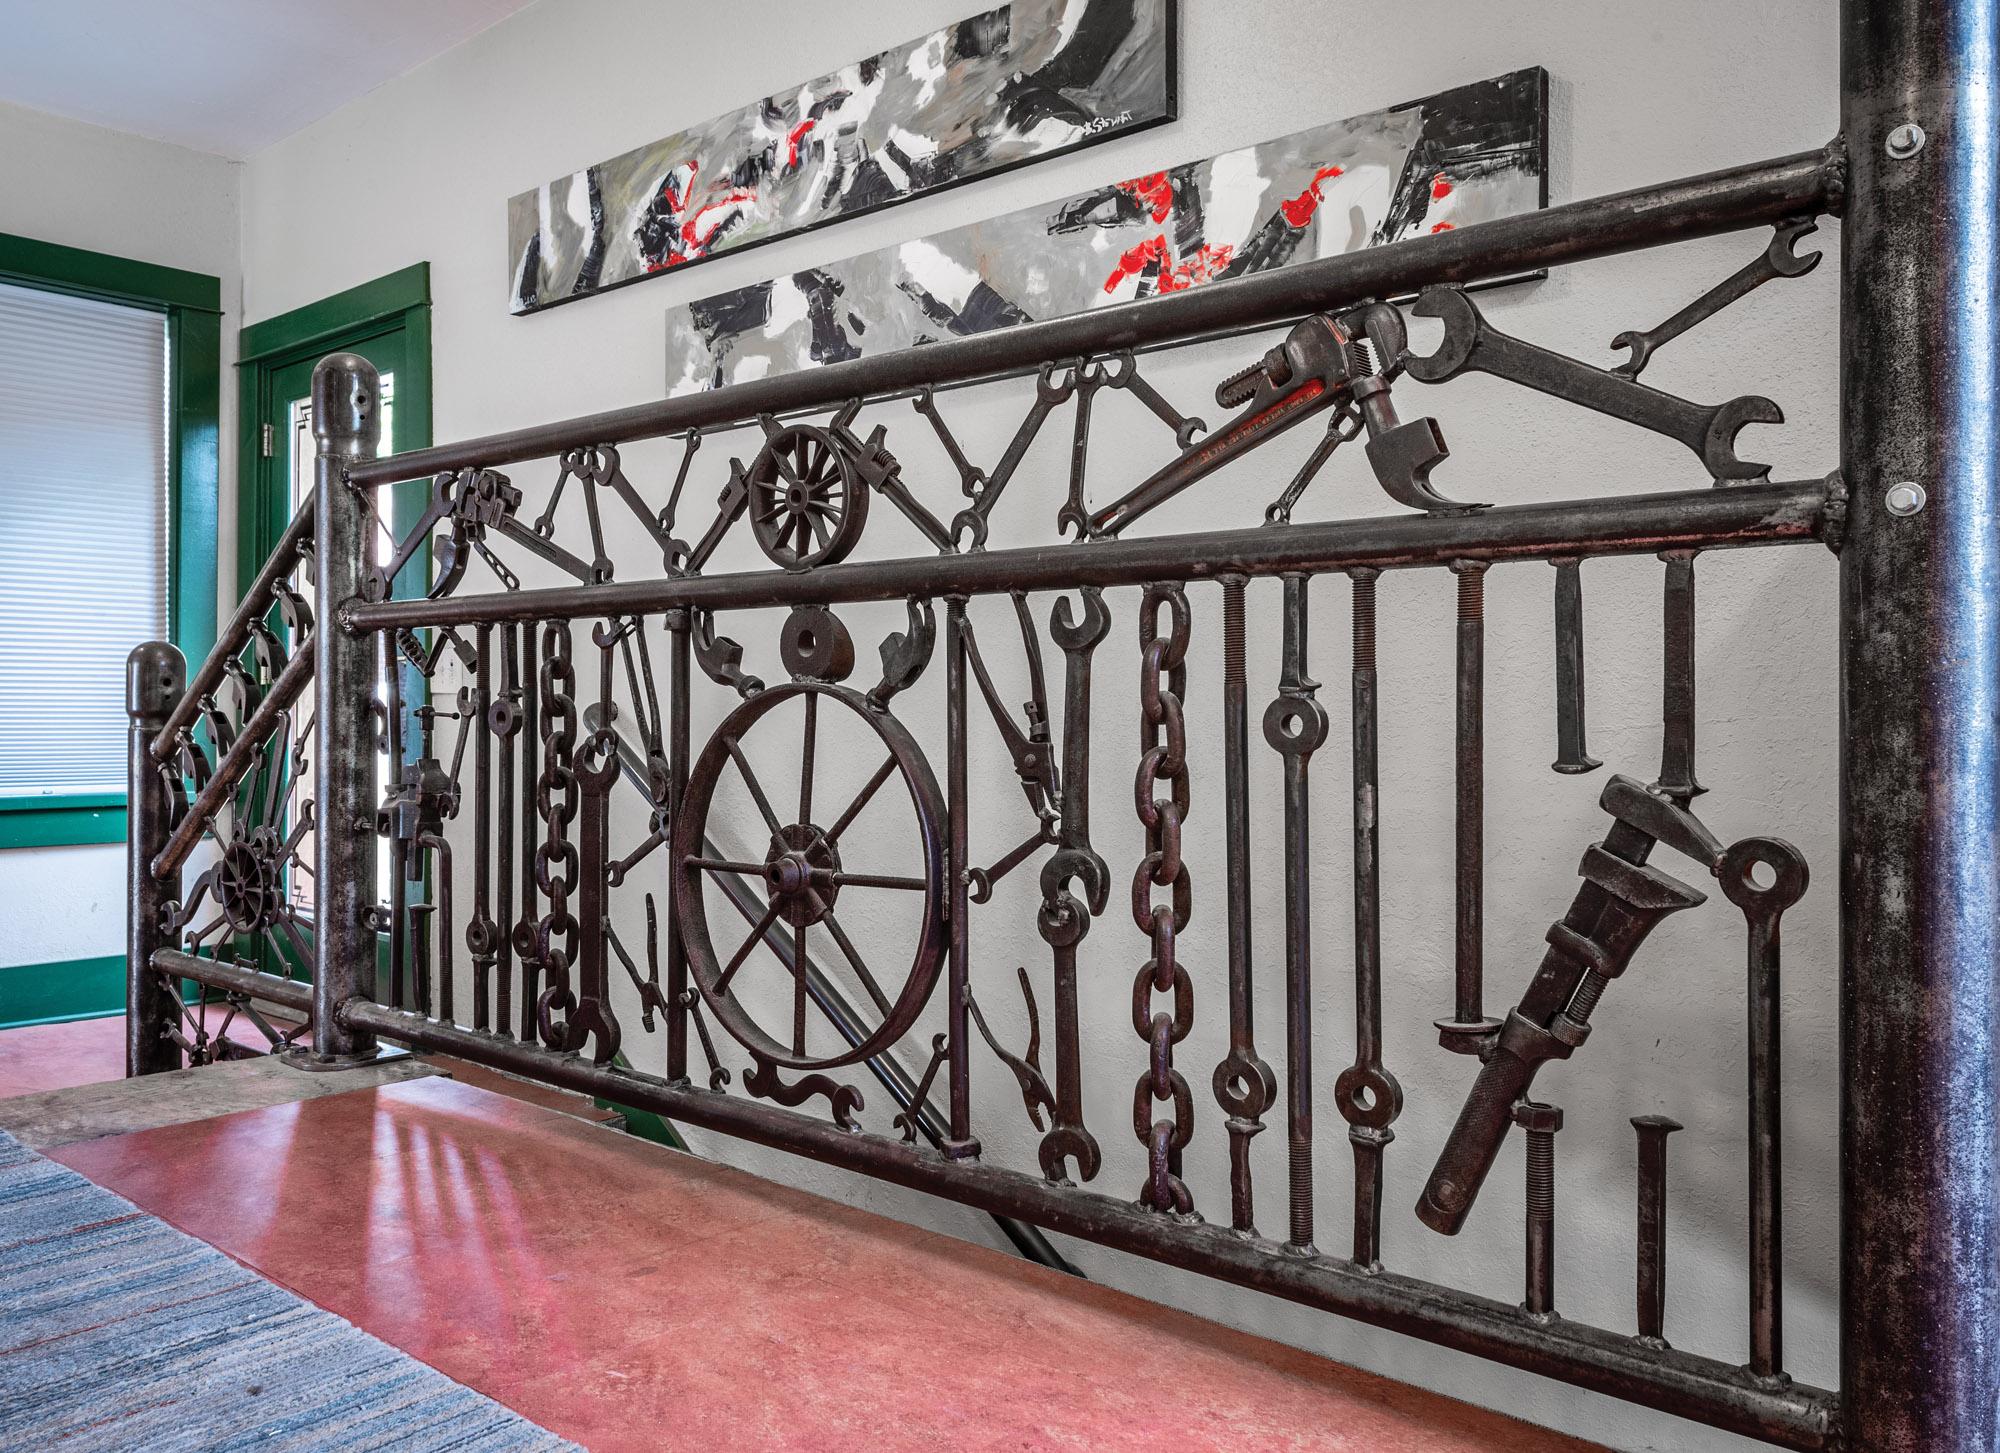 A Unique Stair Railing Made of Repurposed Materials